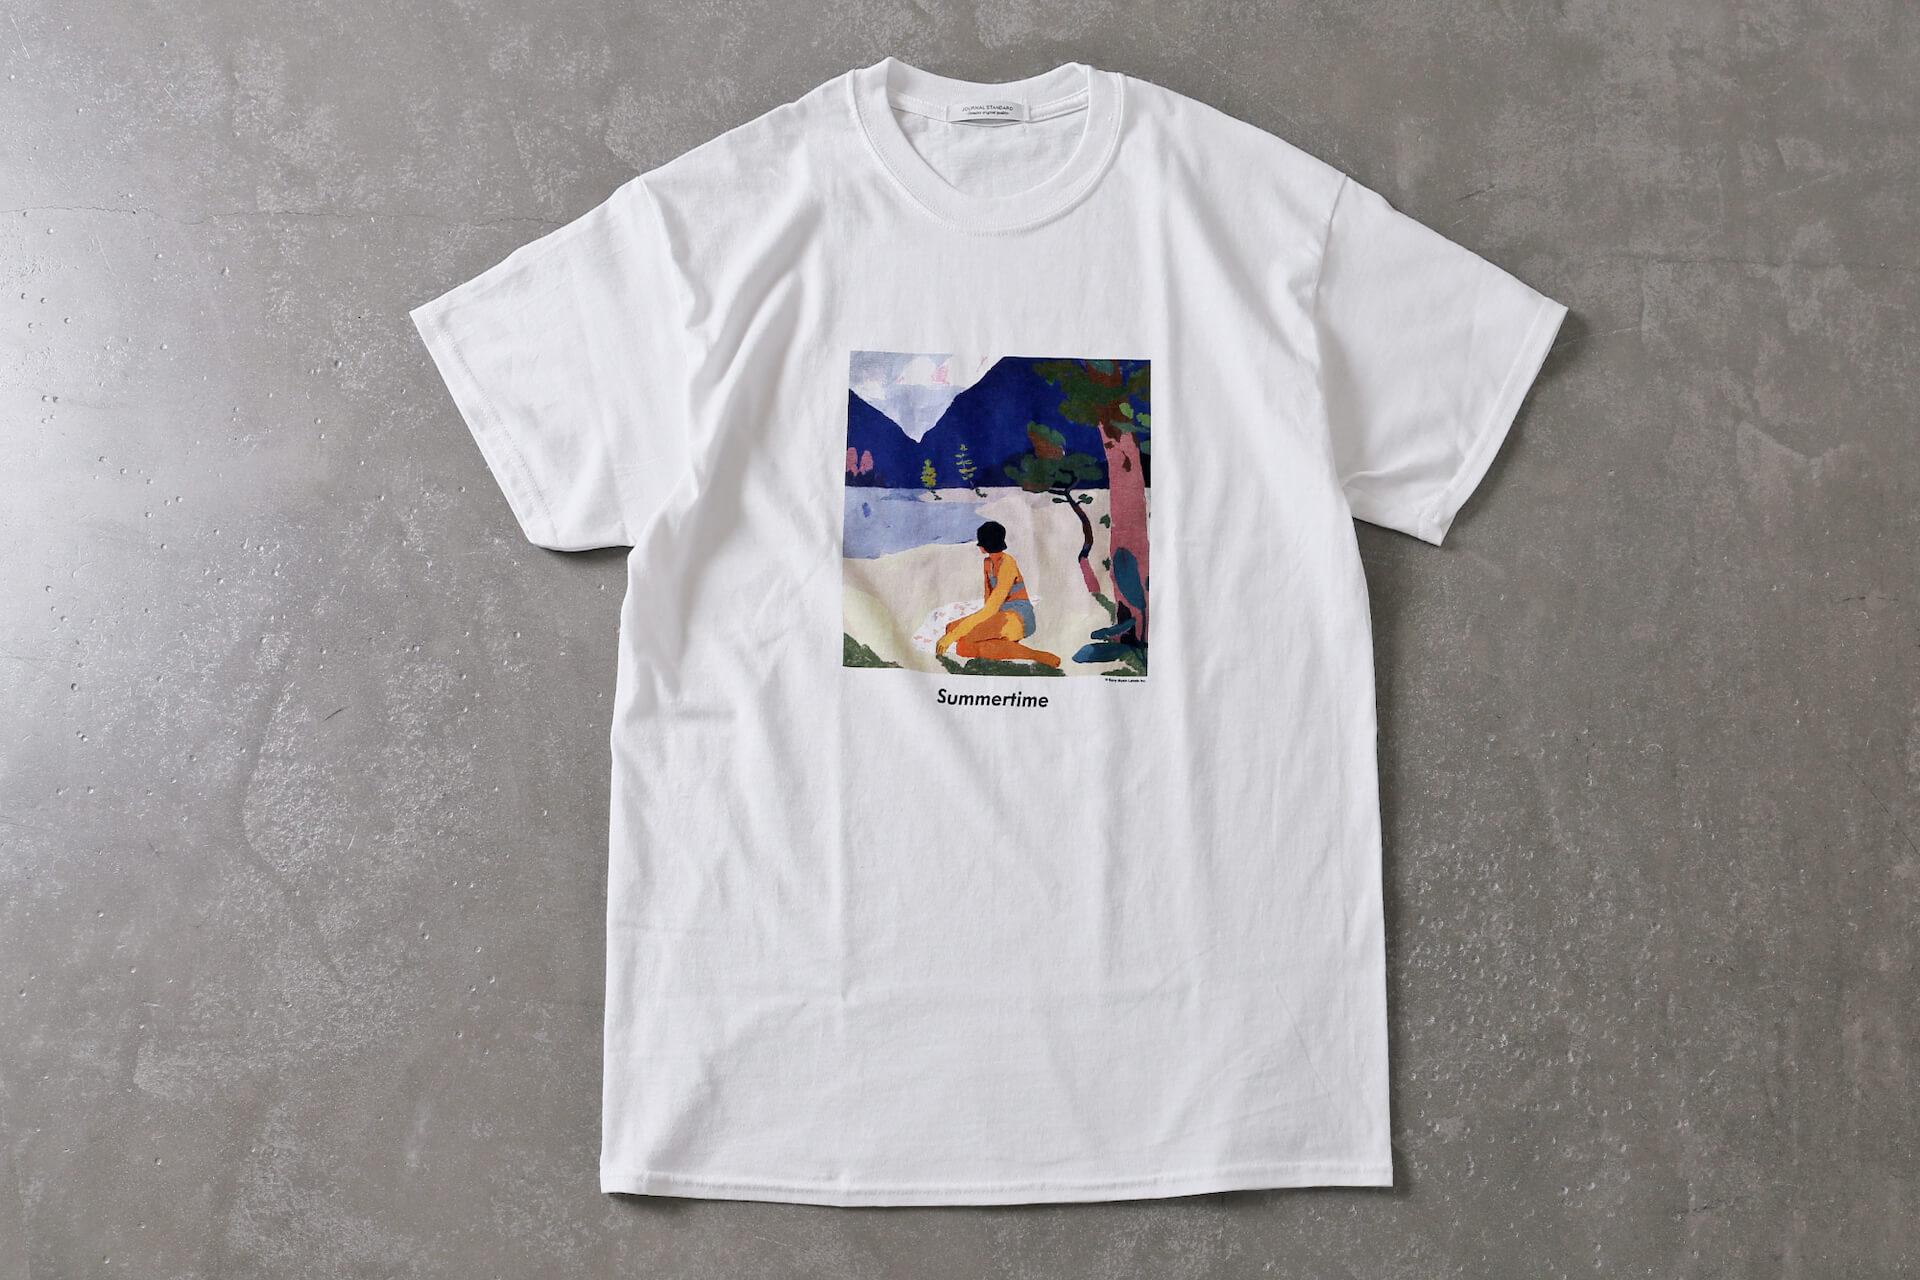 "RIRI, KEIJU, 小袋成彬による「アネッサ」CMソング""Summertime""とJOURNAL STANDARDがコラボ|限定Tシャツが予約販売スタート 190902lifefashion_summertimetshirts02"